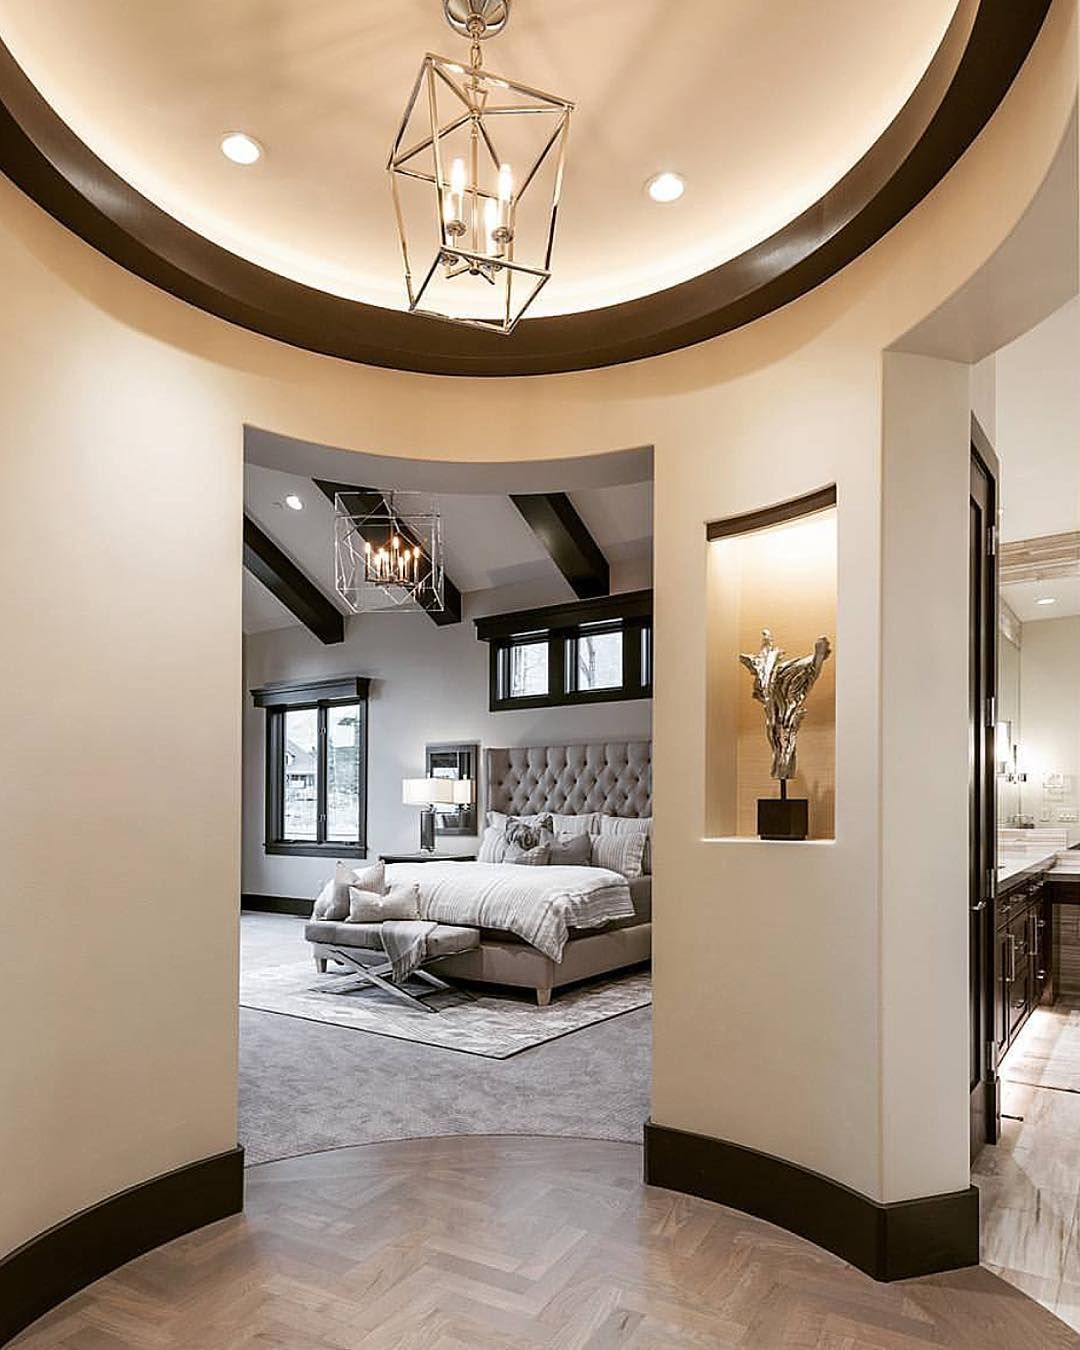 Spectacular Master Suite Entrance By Cameohomesinc Home Decor